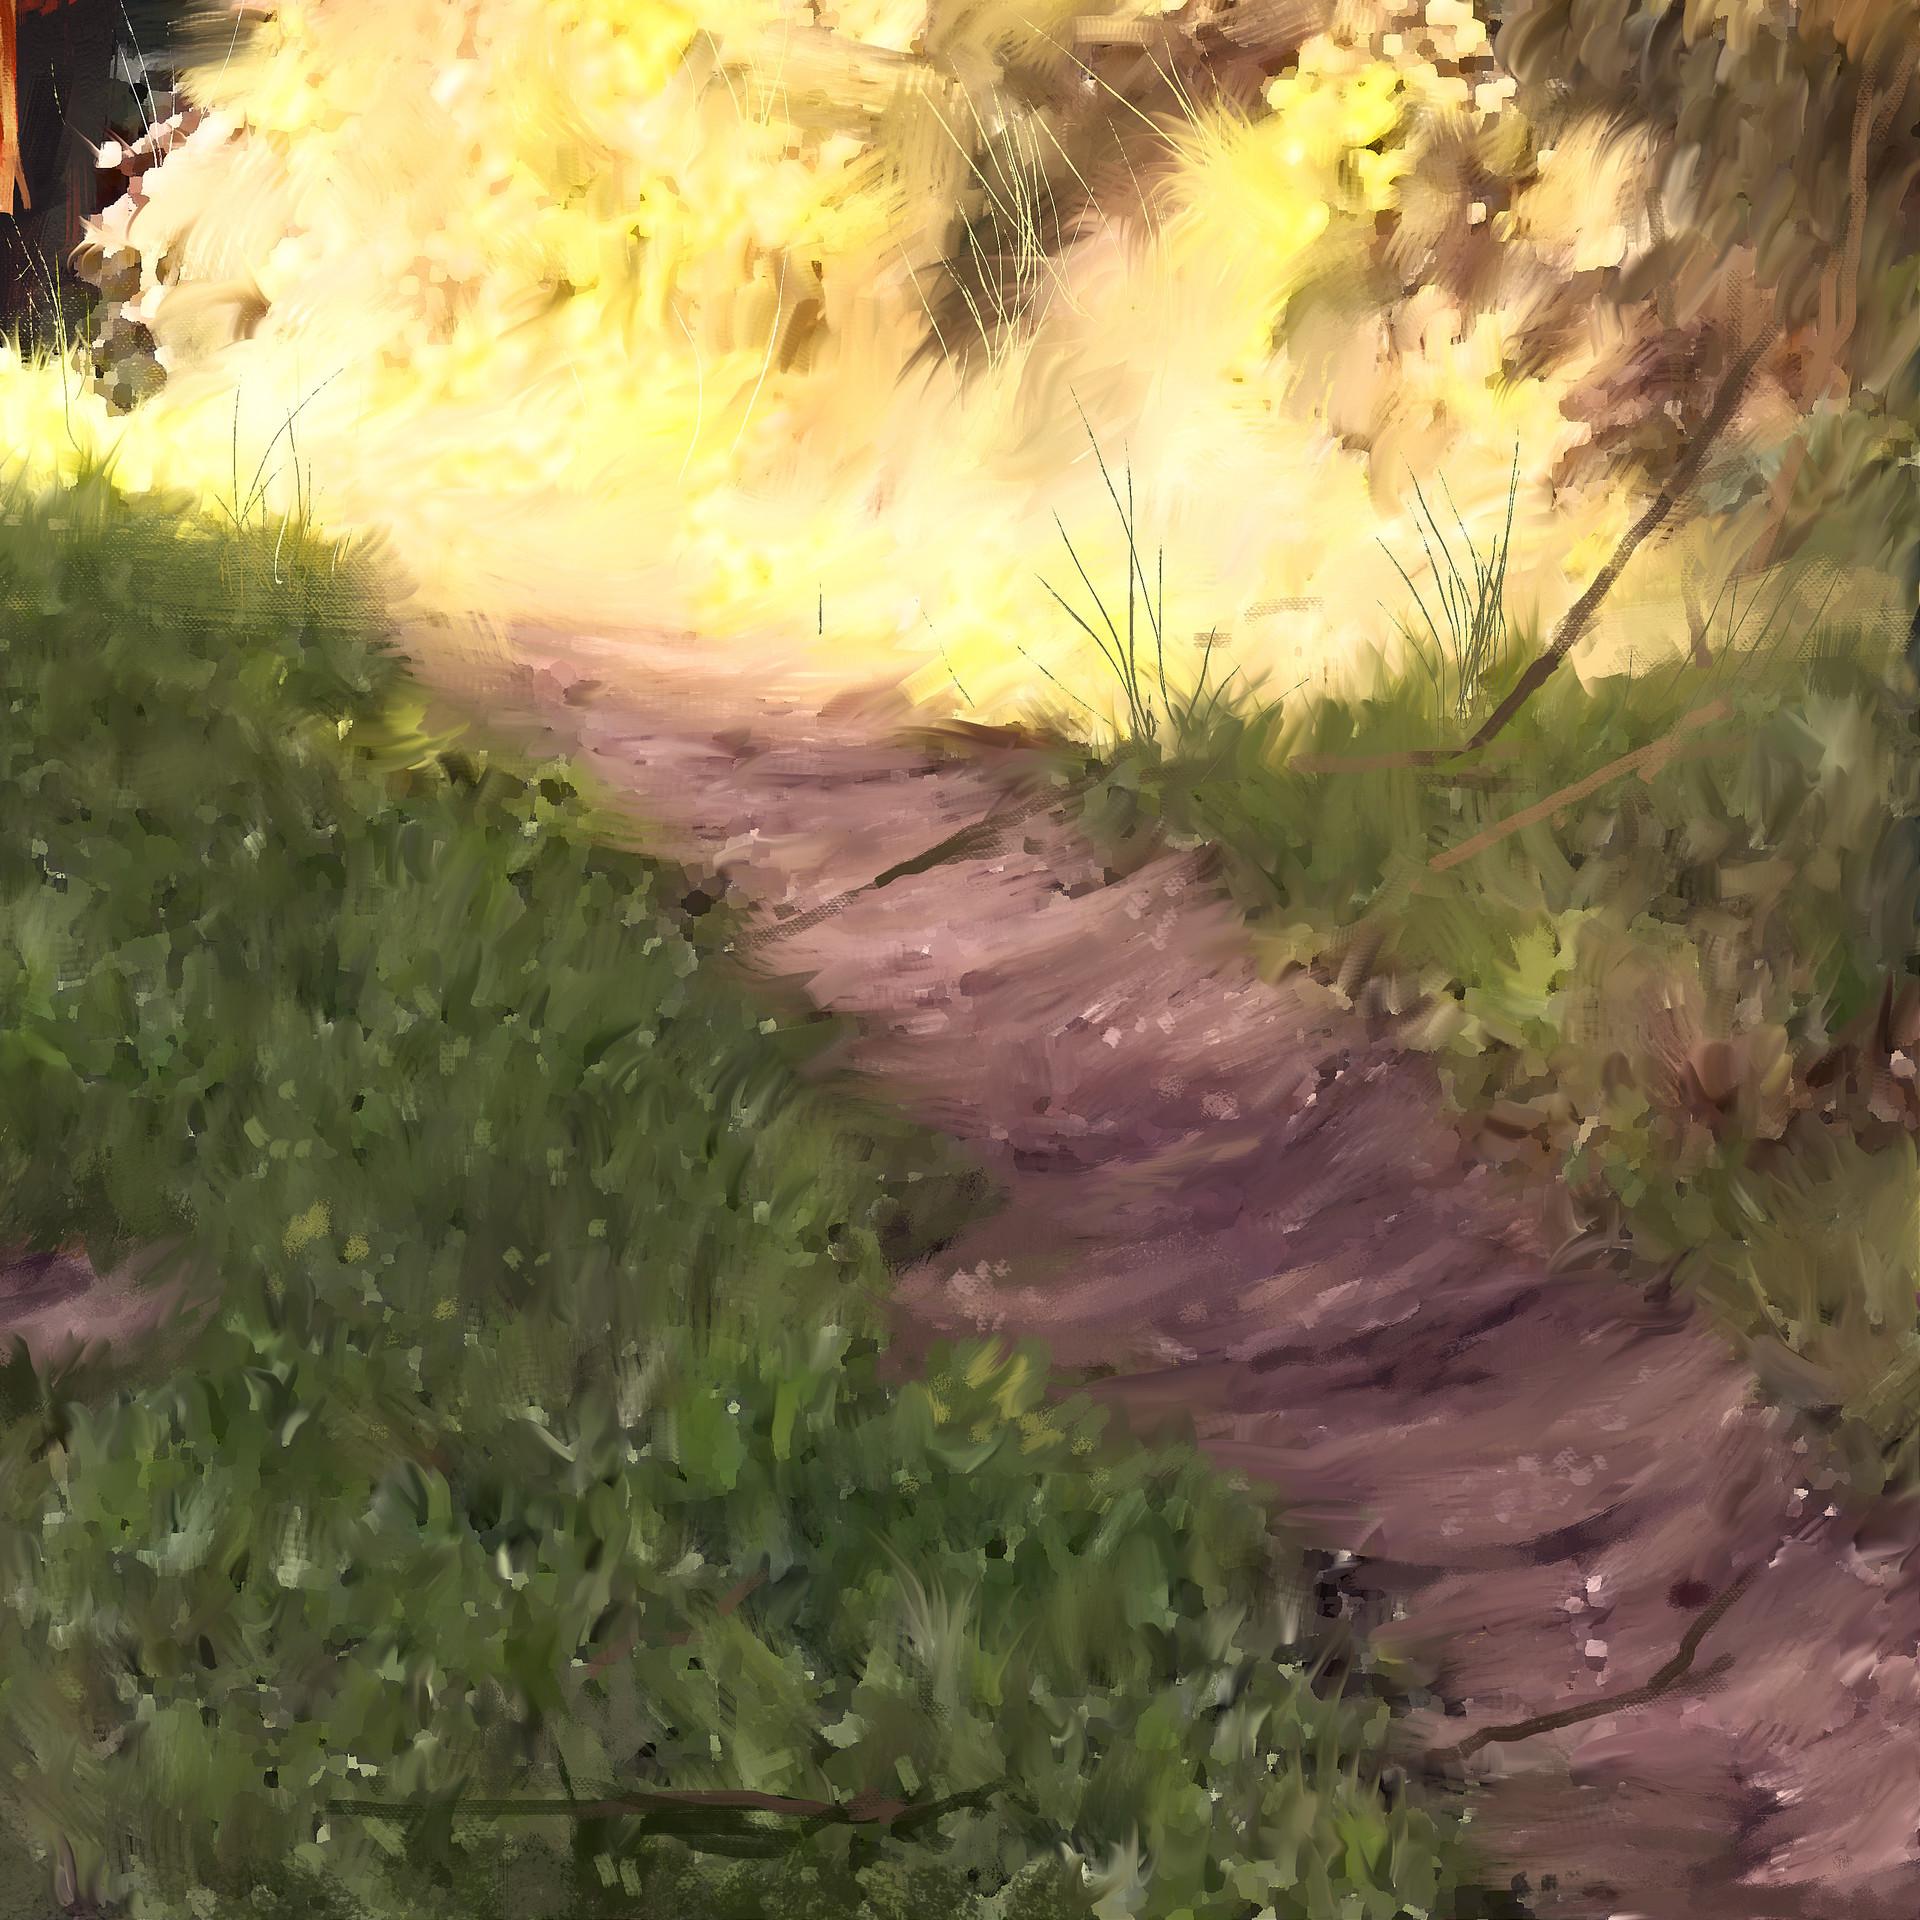 Dominik mayer forestpainting 09 detail04